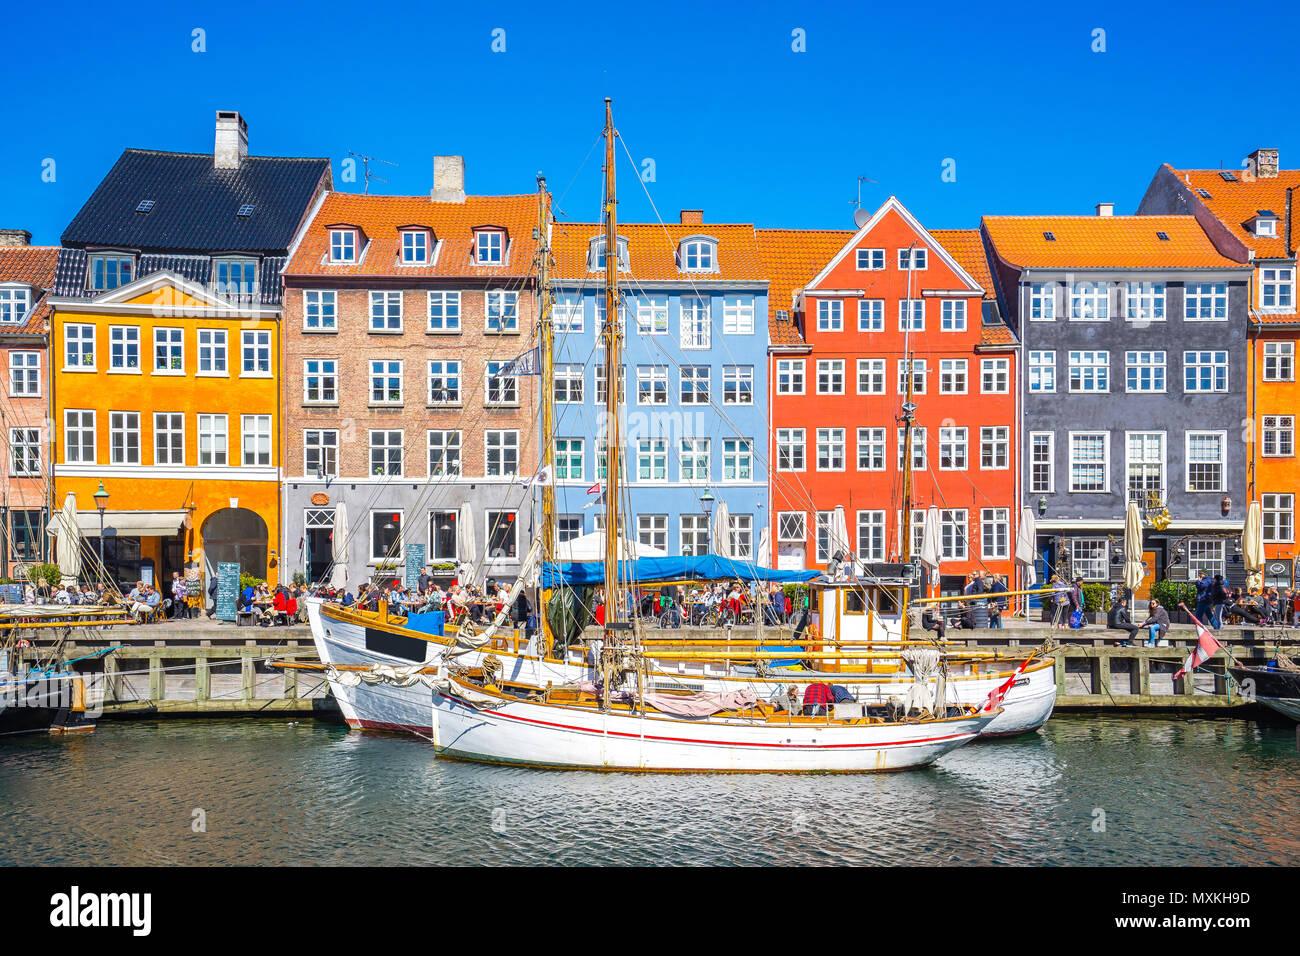 Nyhavn the waterfront canal in Copenhagen, Denmark. - Stock Image